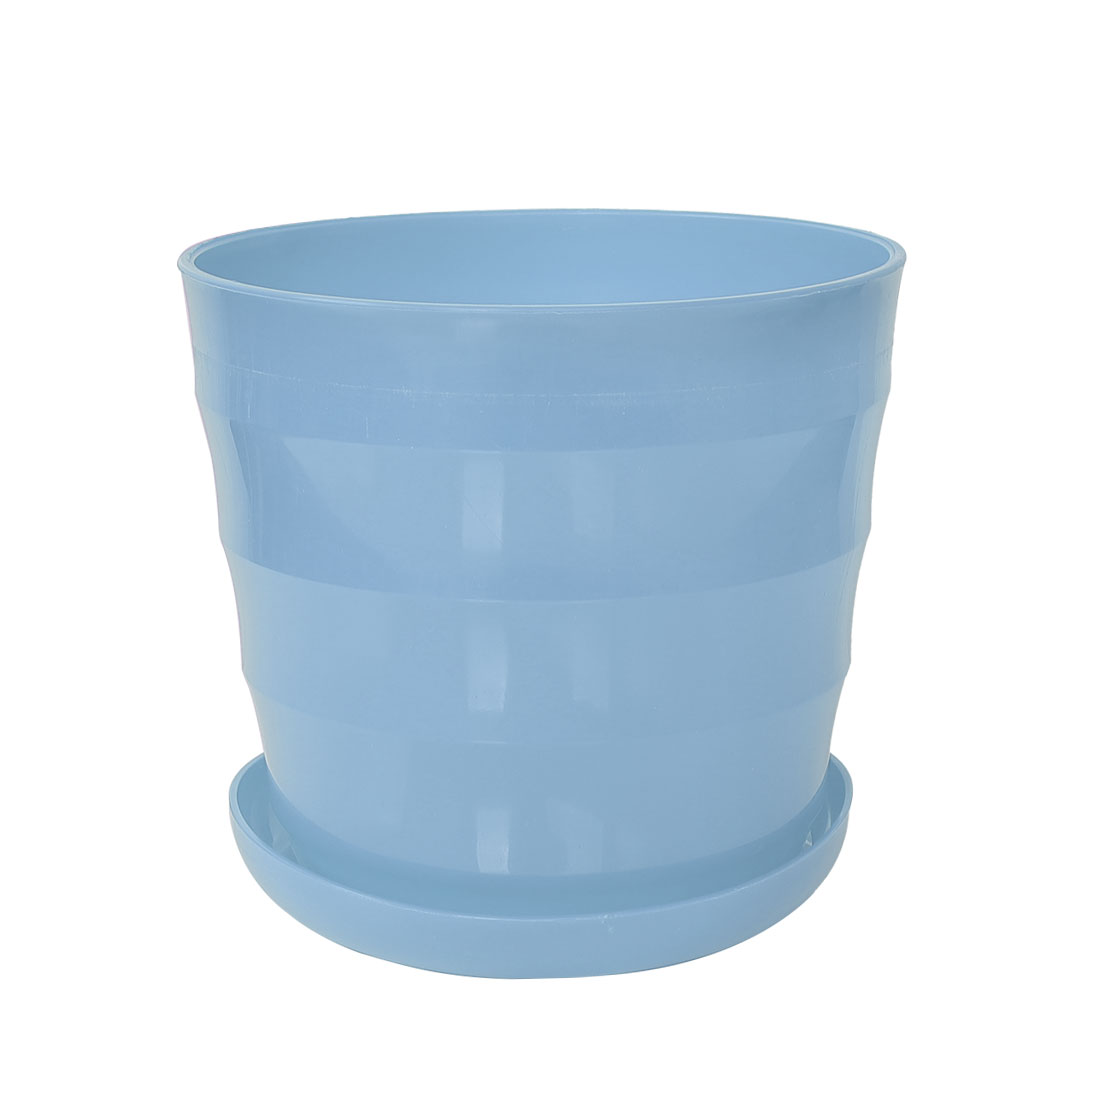 Home Balcony Garden Plastic Round Plant Planter Container Flower Pot Sky Blue